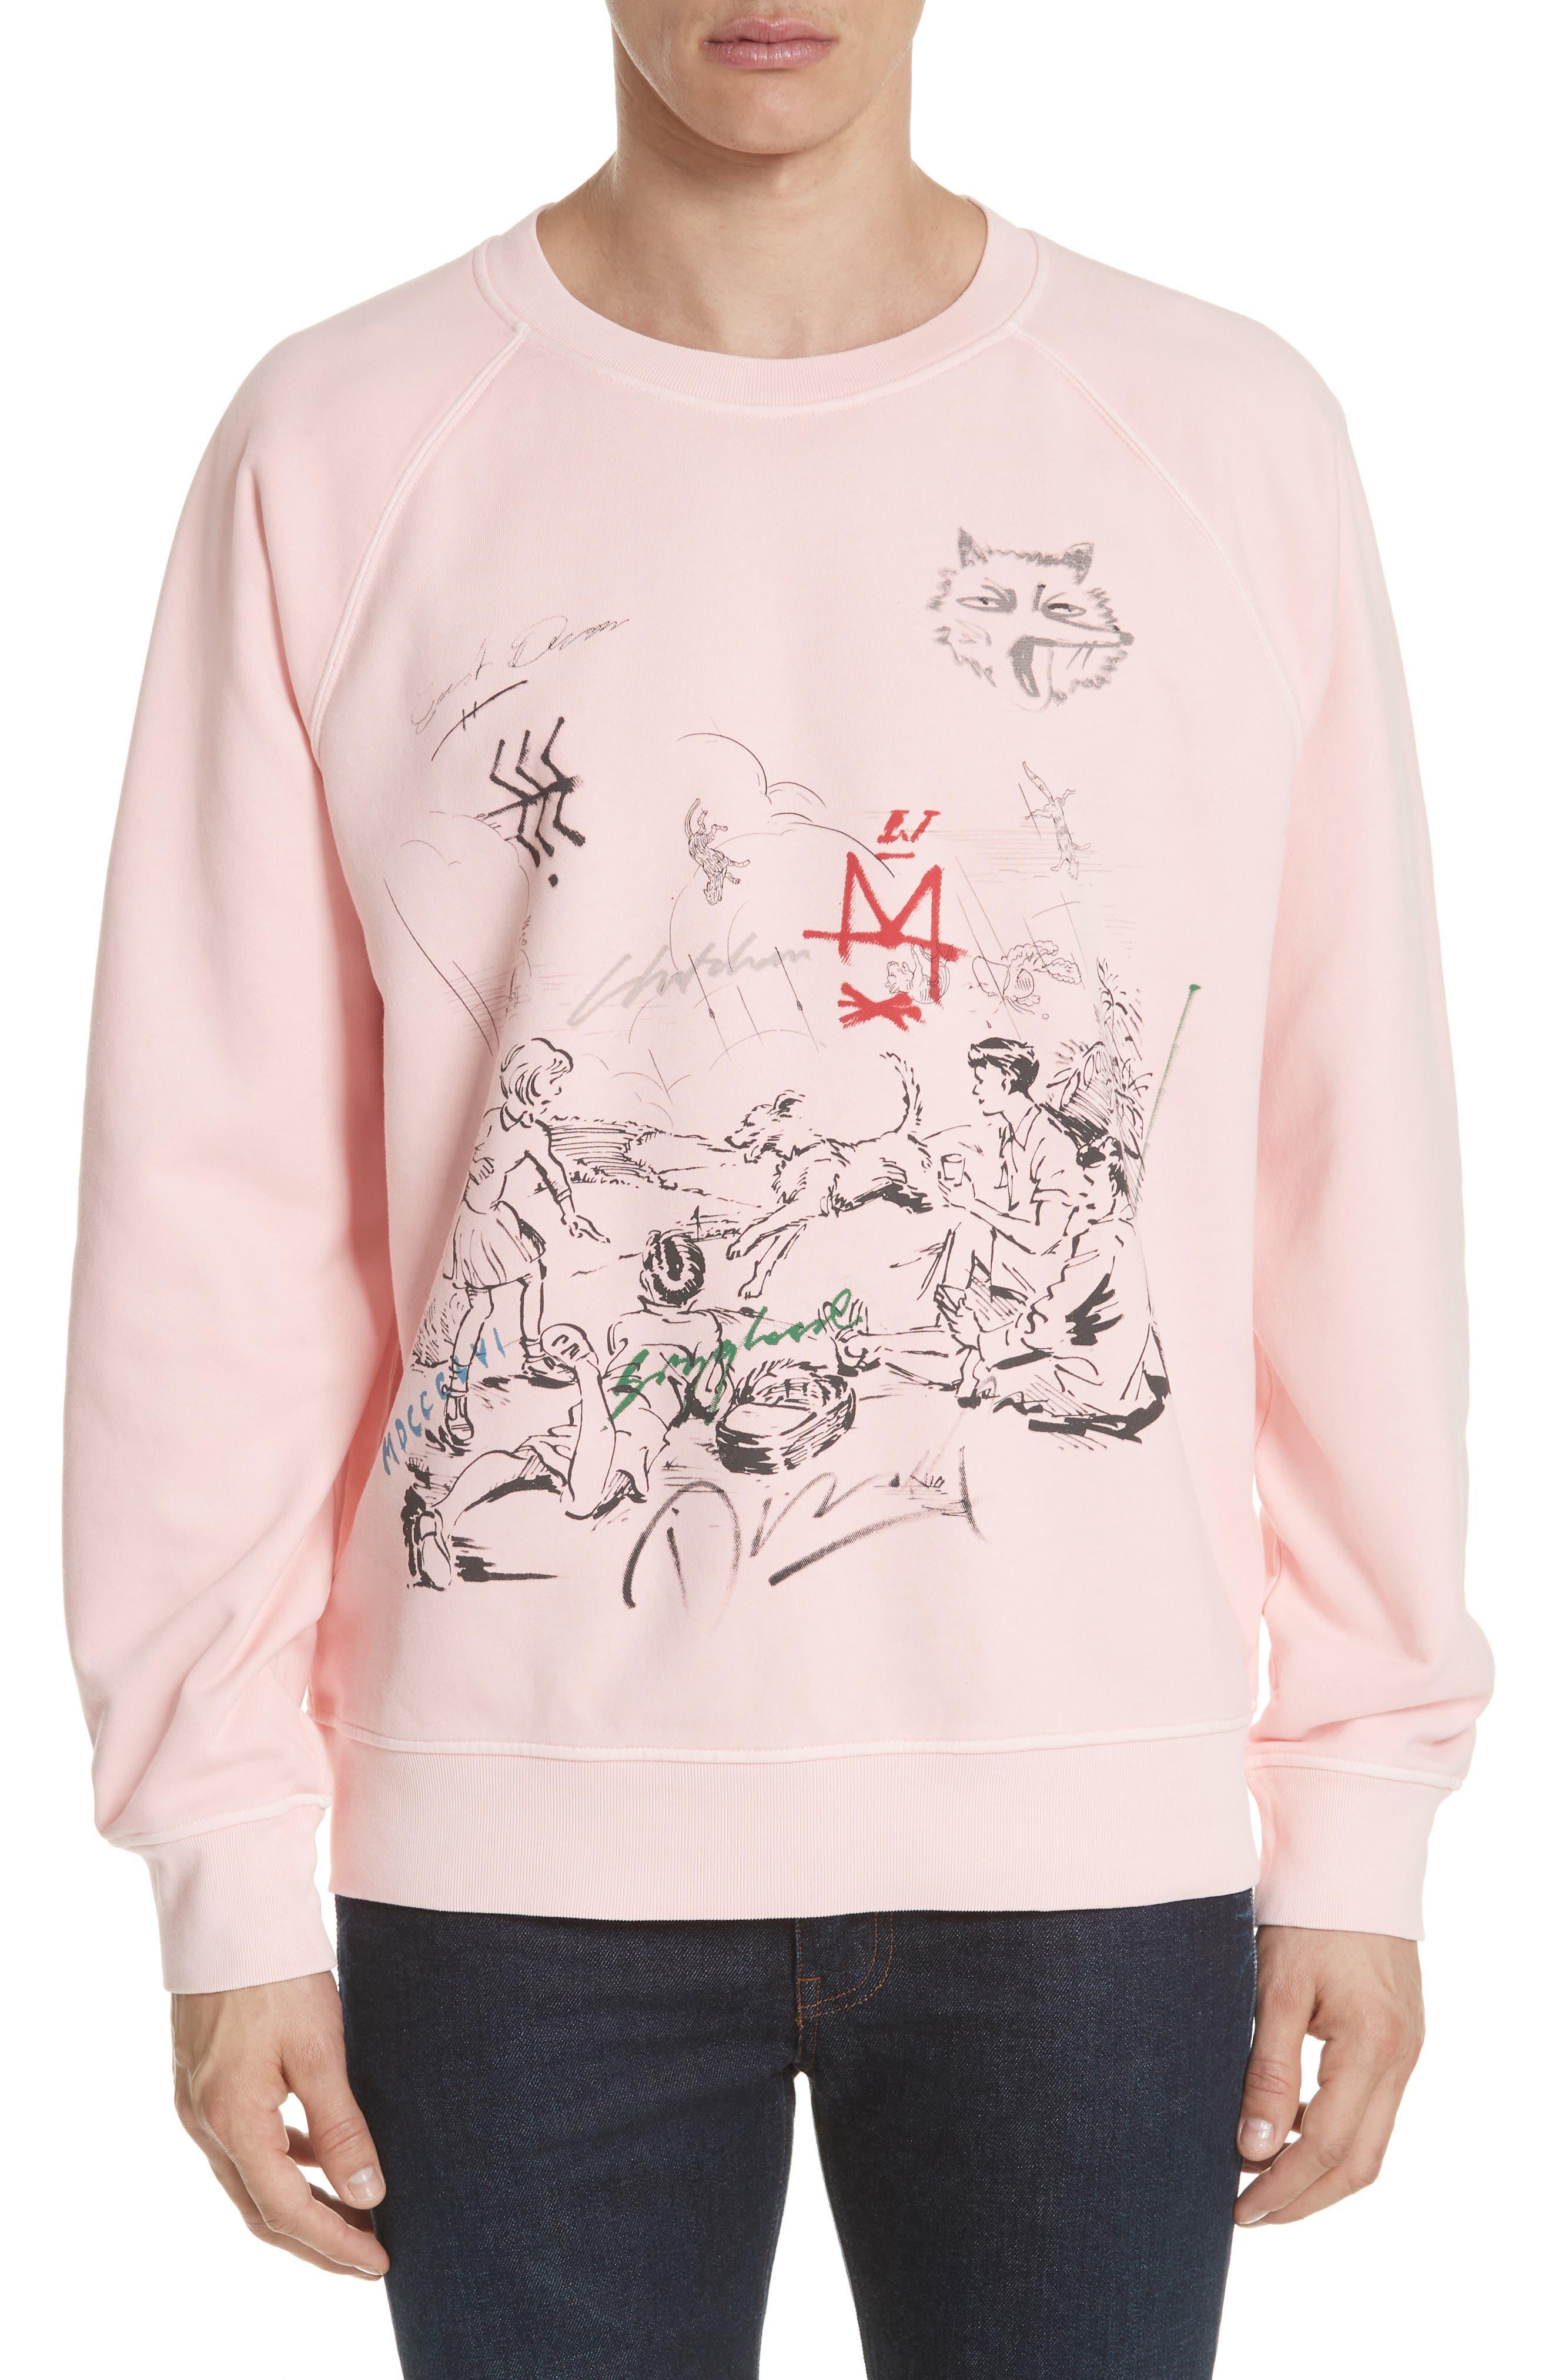 Fellworth Graphic Crewneck Sweatshirt,                             Main thumbnail 1, color,                             685